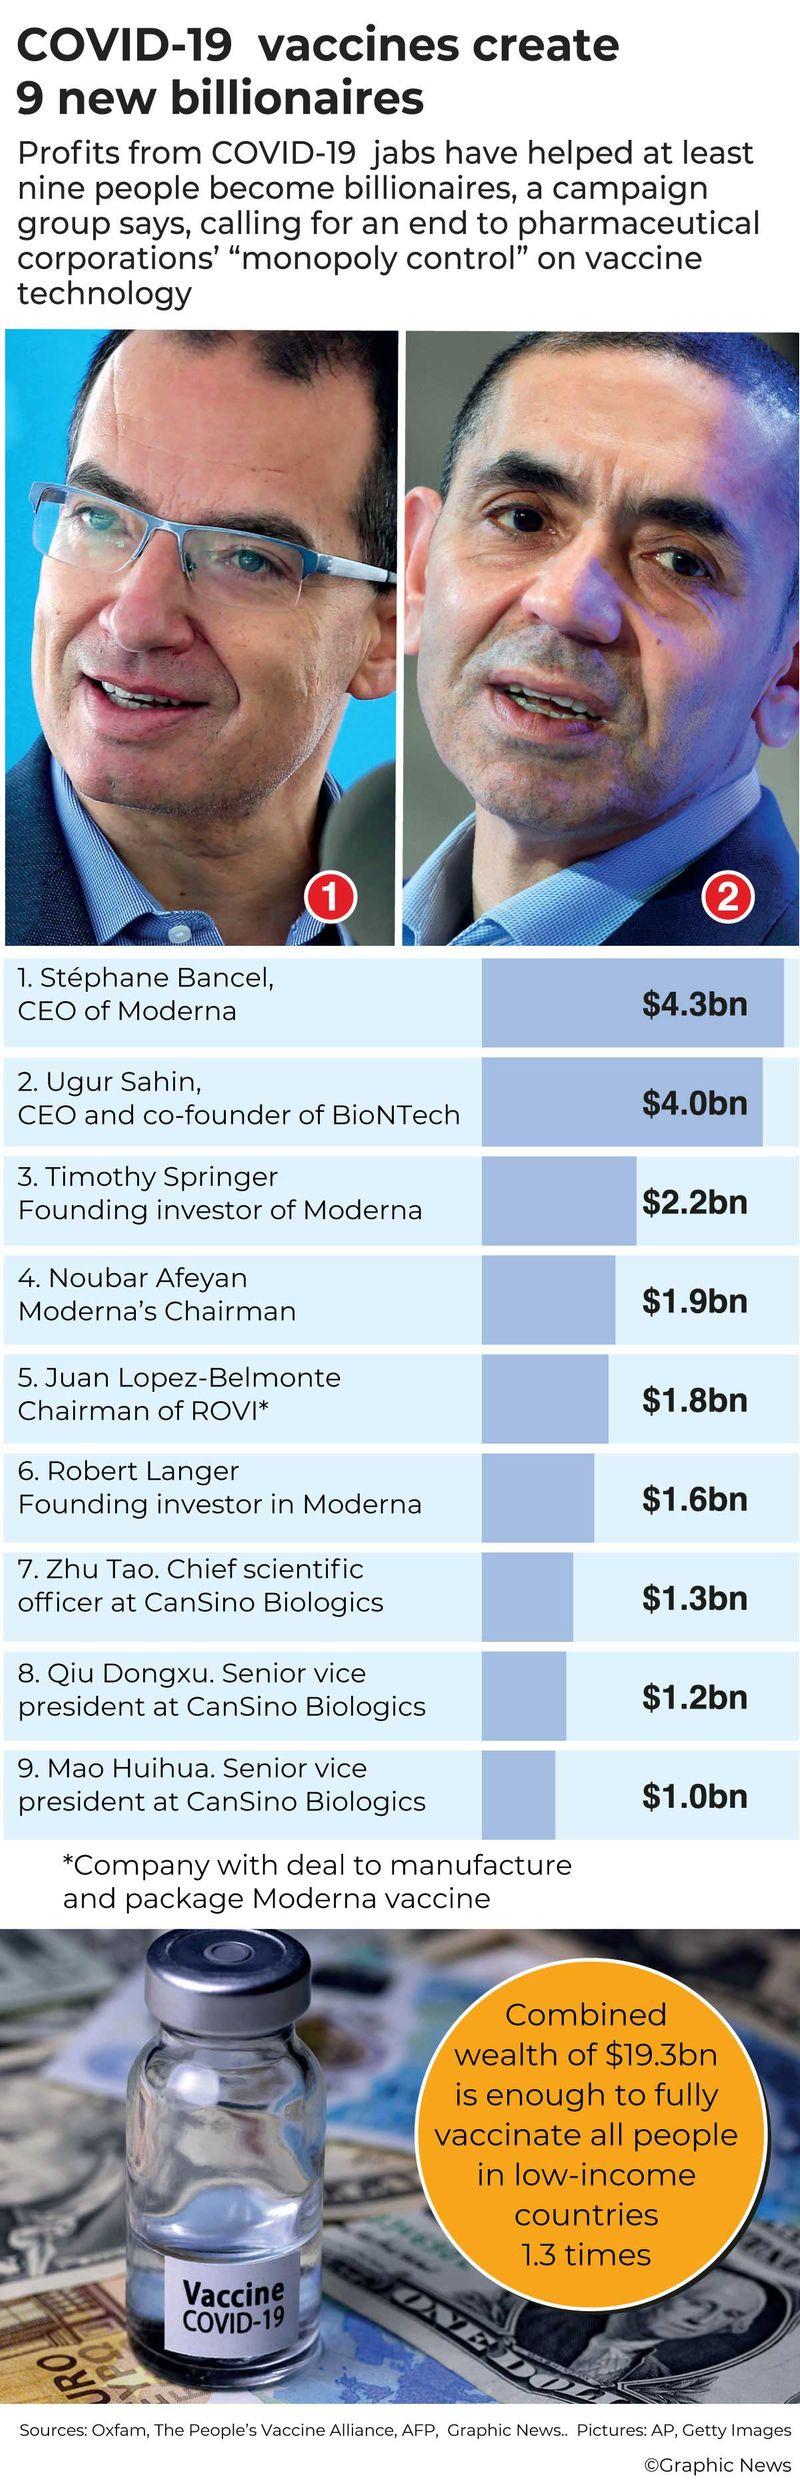 20210523 covid-19 vaccine billionaires